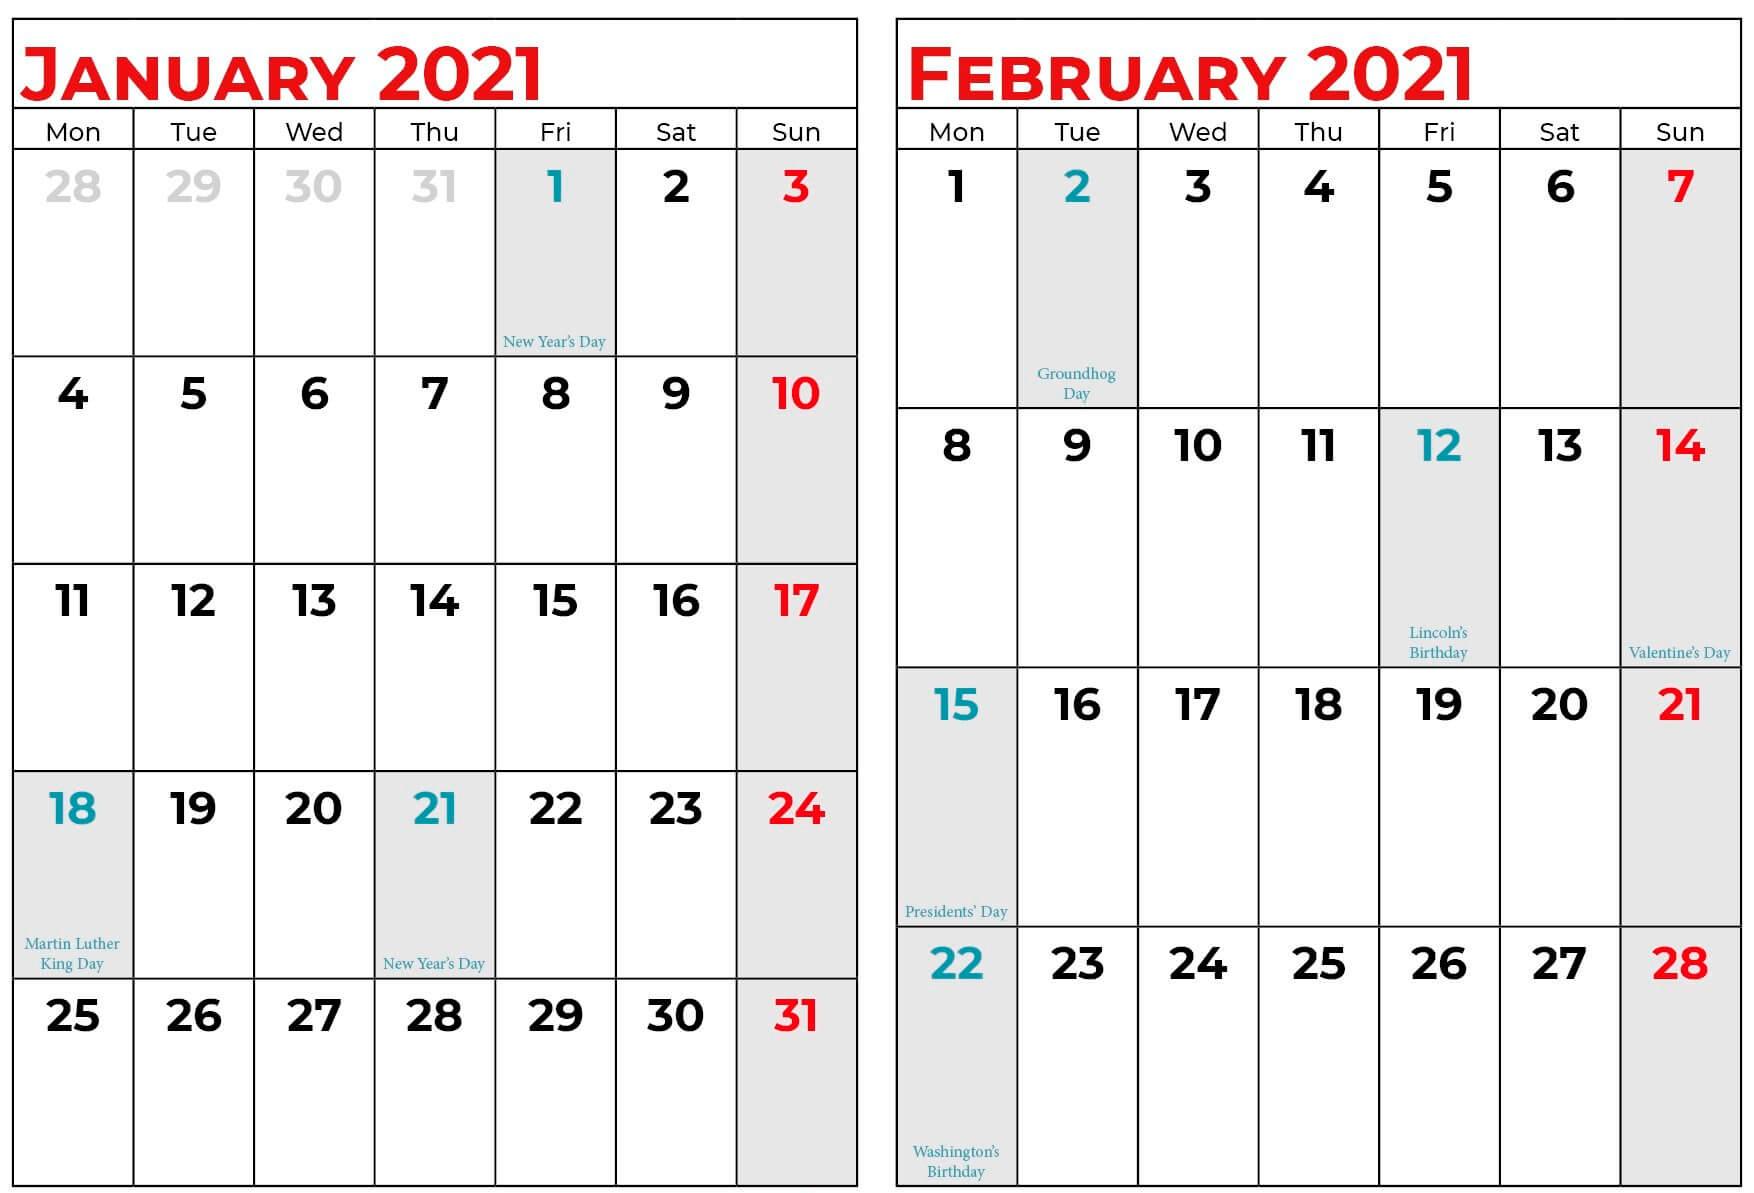 Calendar For January and February 2021